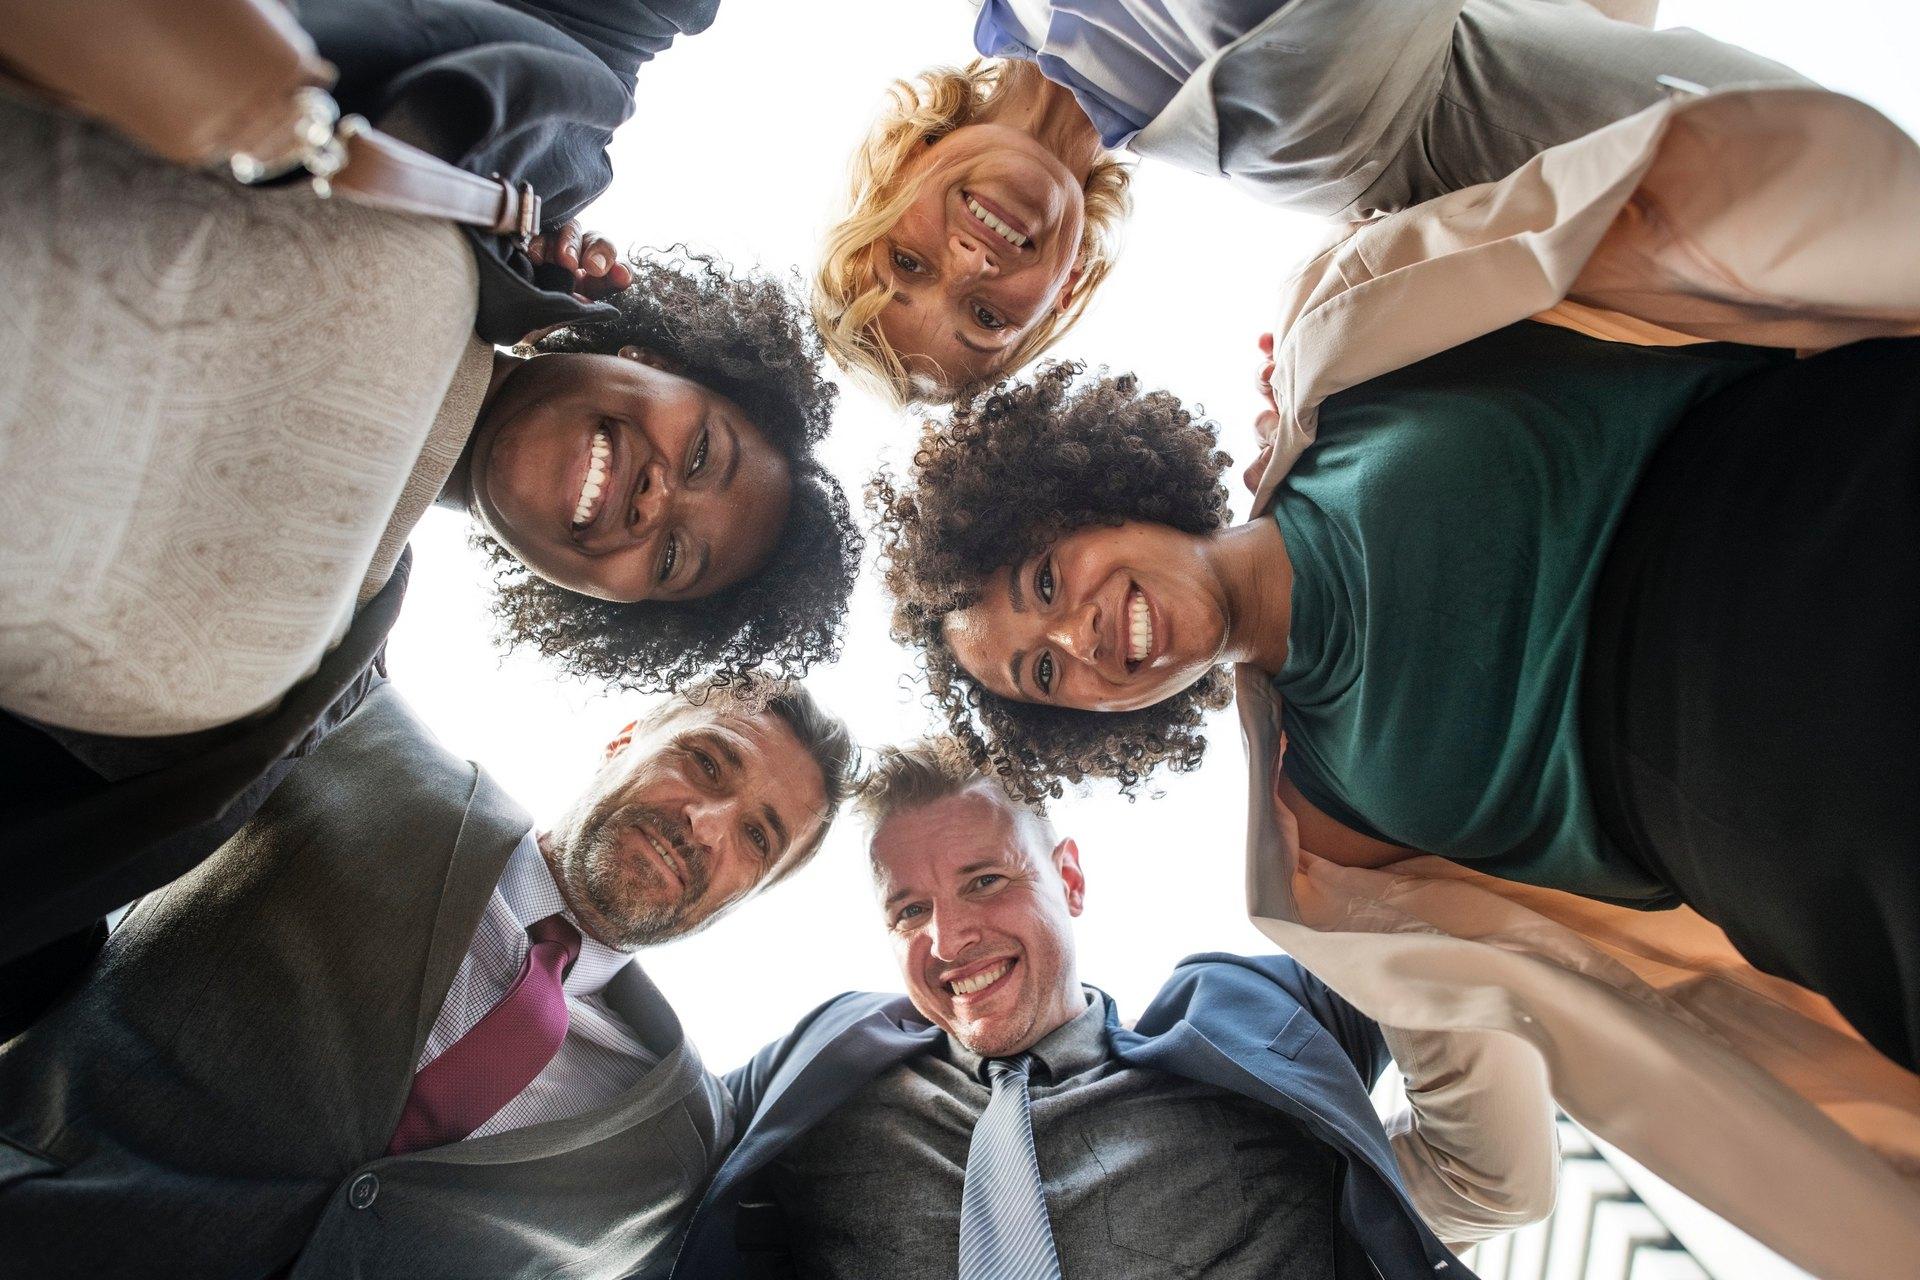 affiliate marketing helps blog people